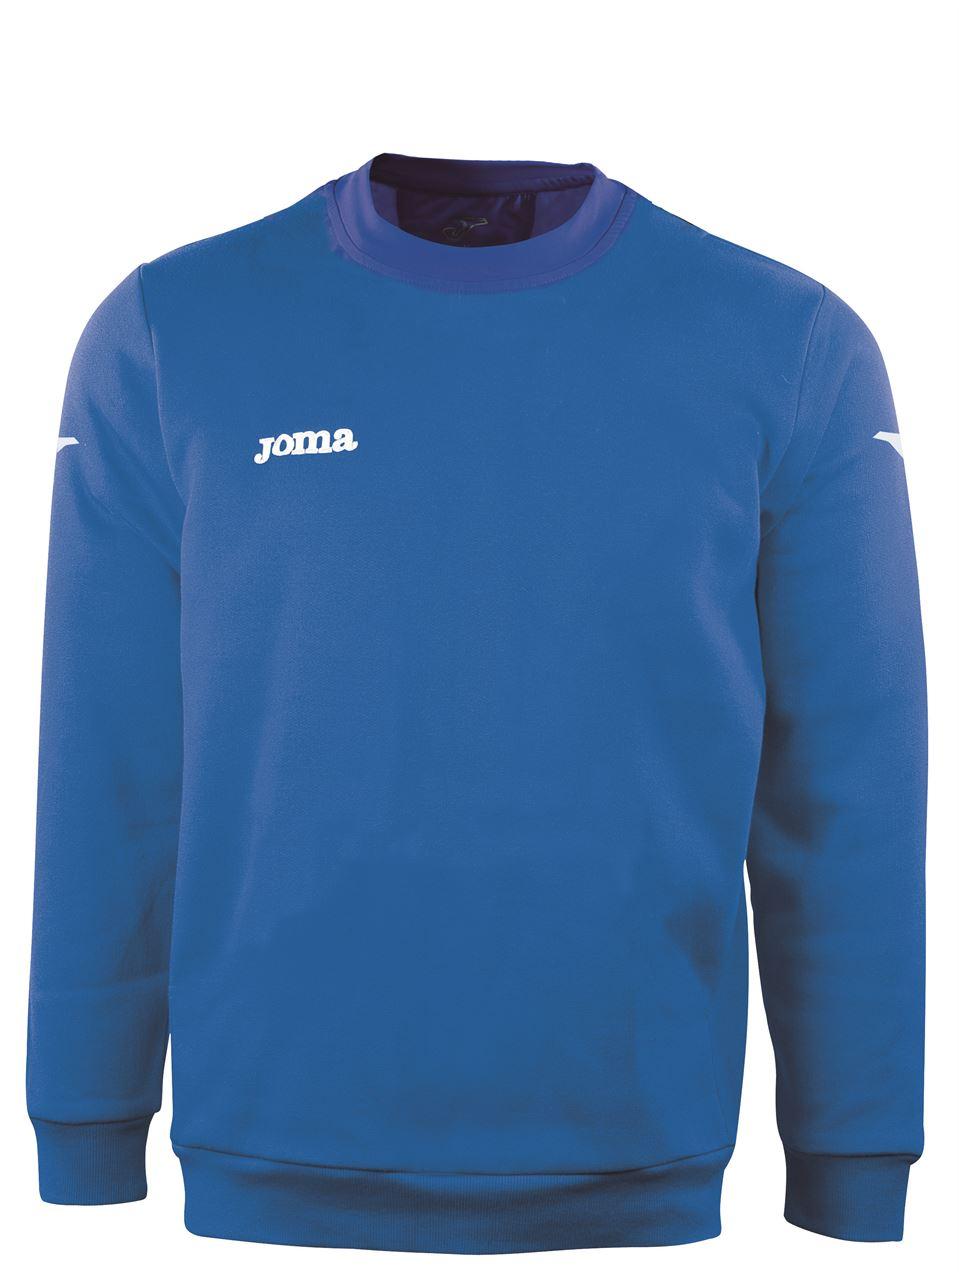 Joma Combi Cairo Adult Polyester Sweatshirt 6015.11